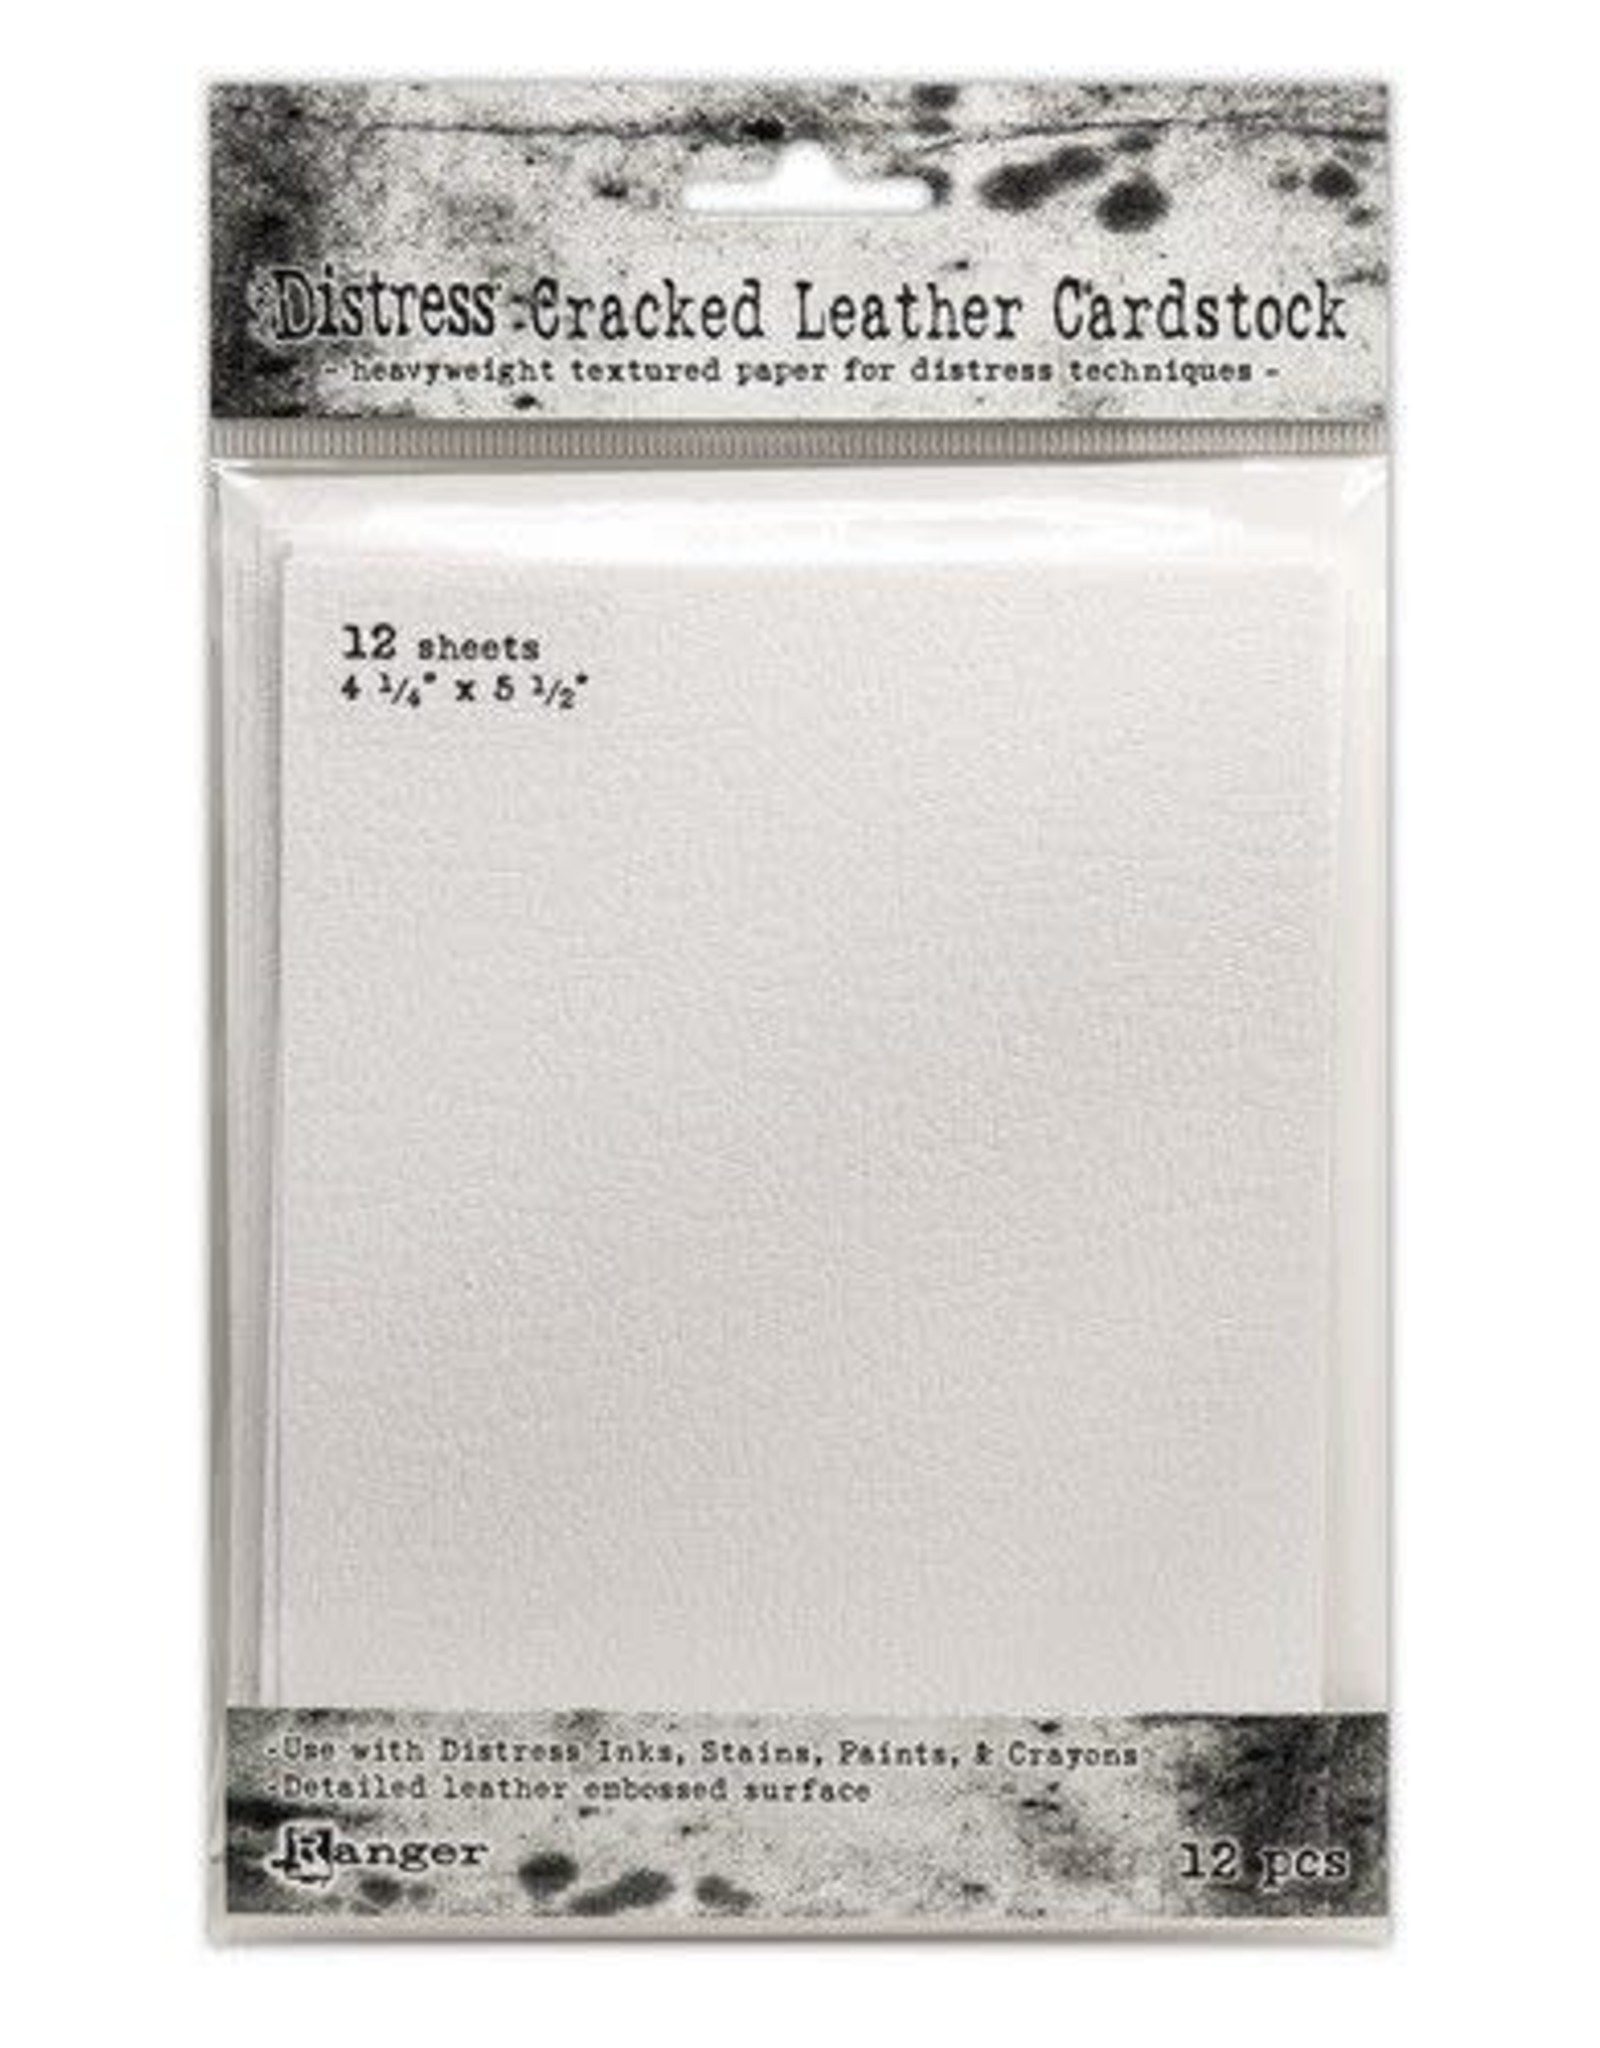 Ranger Ranger Distress Cracked Leather Paper 4.25x5.5 12 vel TDA71310